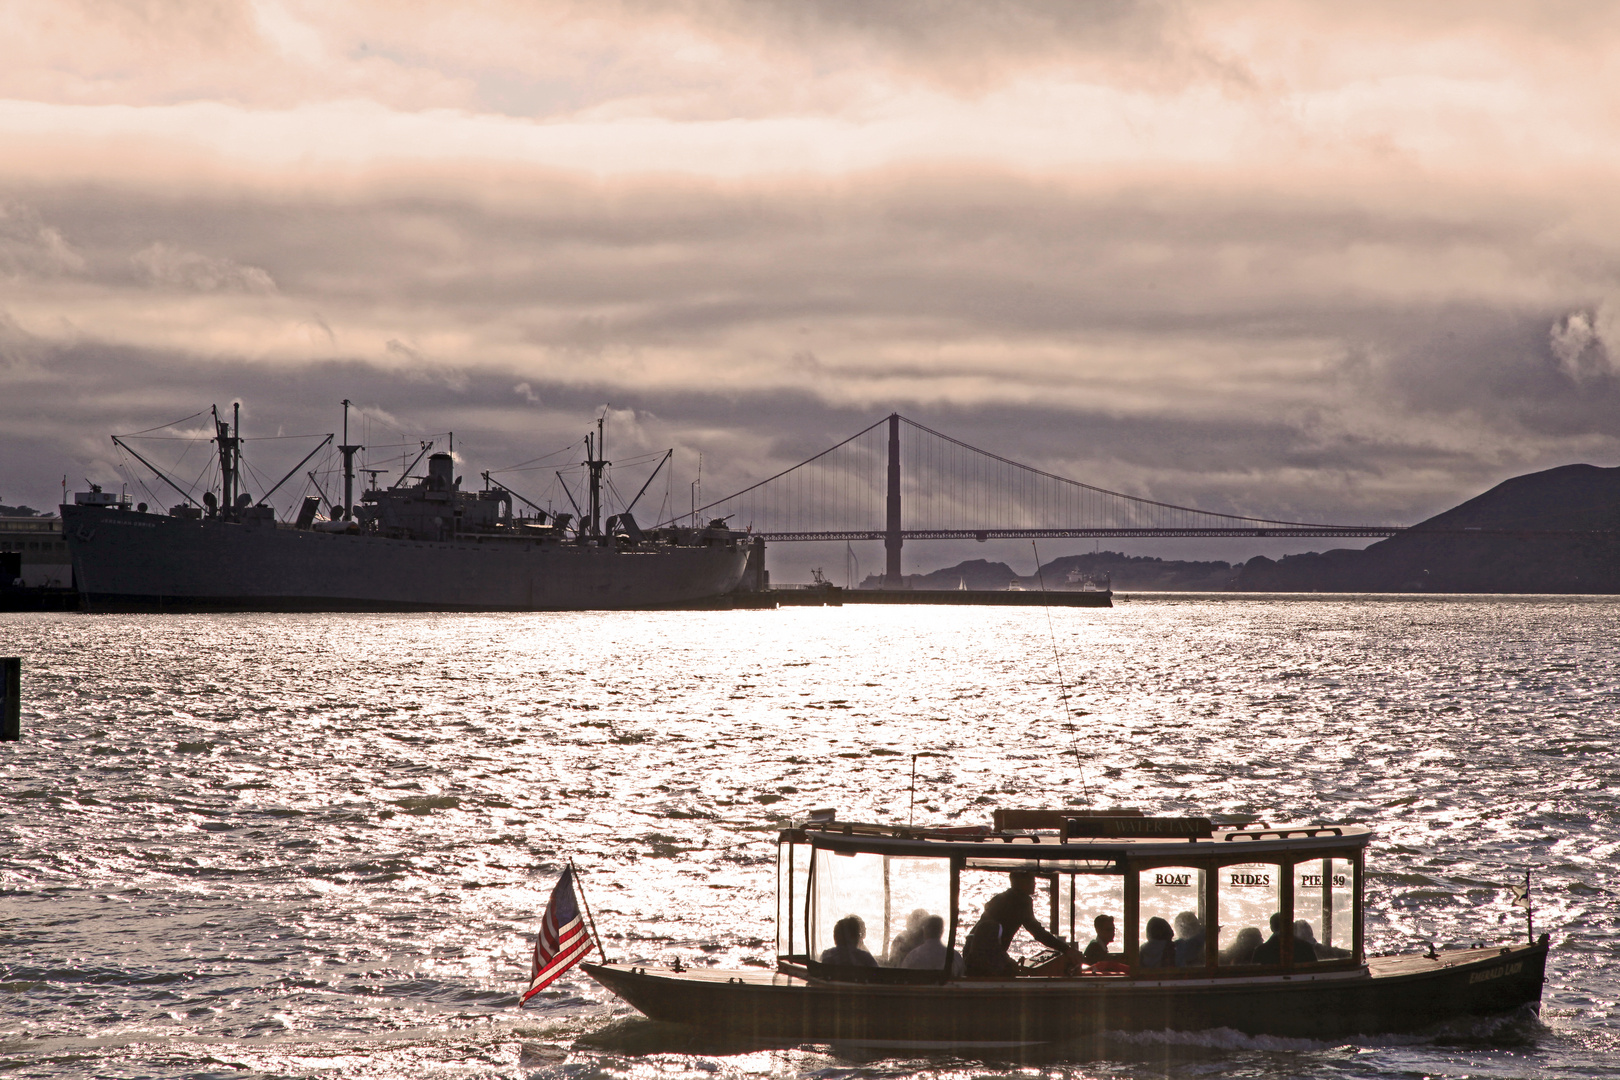 Golden Gate - Golden hour